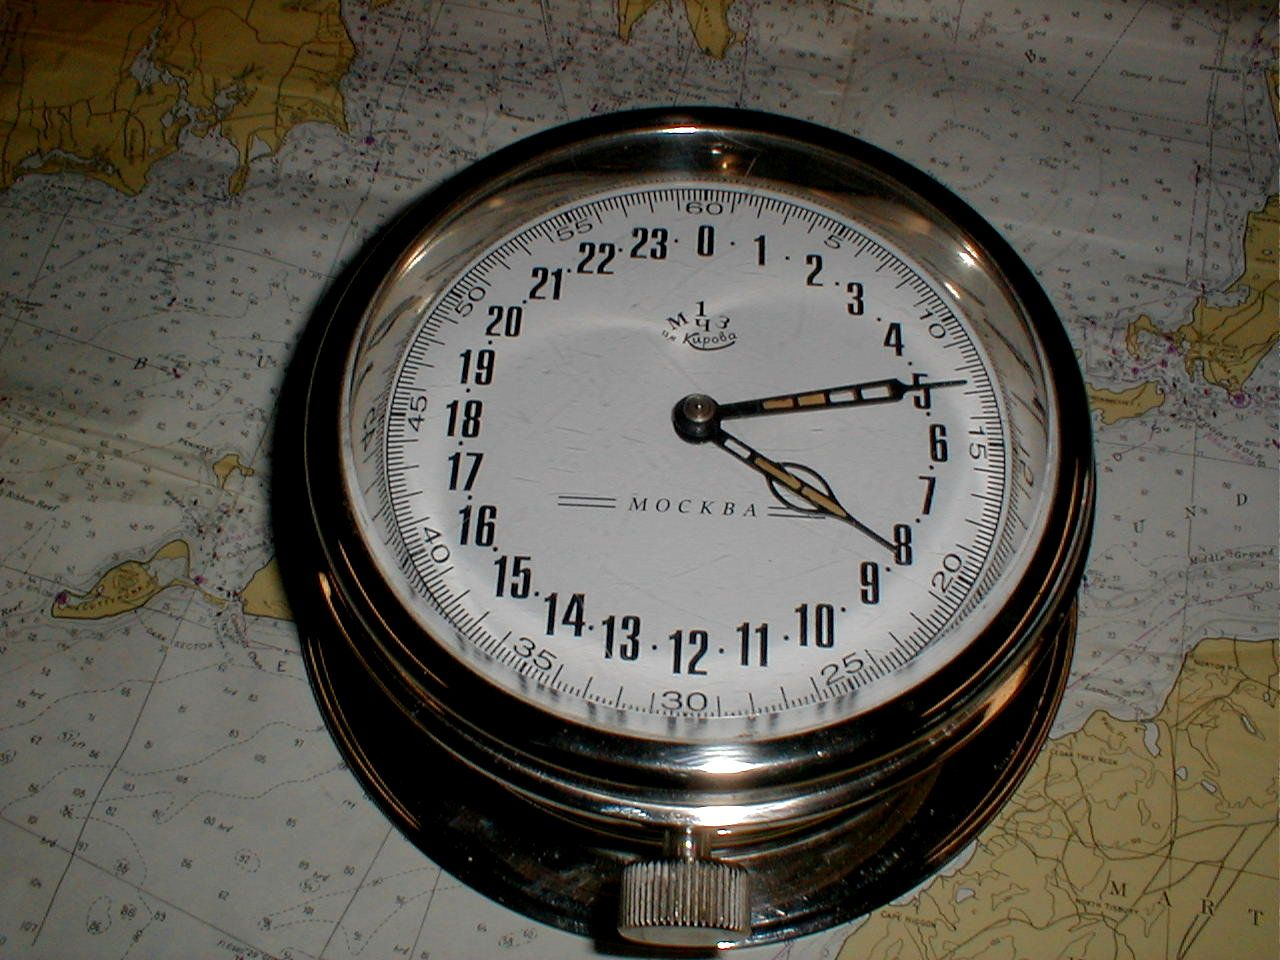 Antique soviet 24 hour ship clock bridgecb collect ems antique soviet 24 hour ship clock bridgecb amipublicfo Images